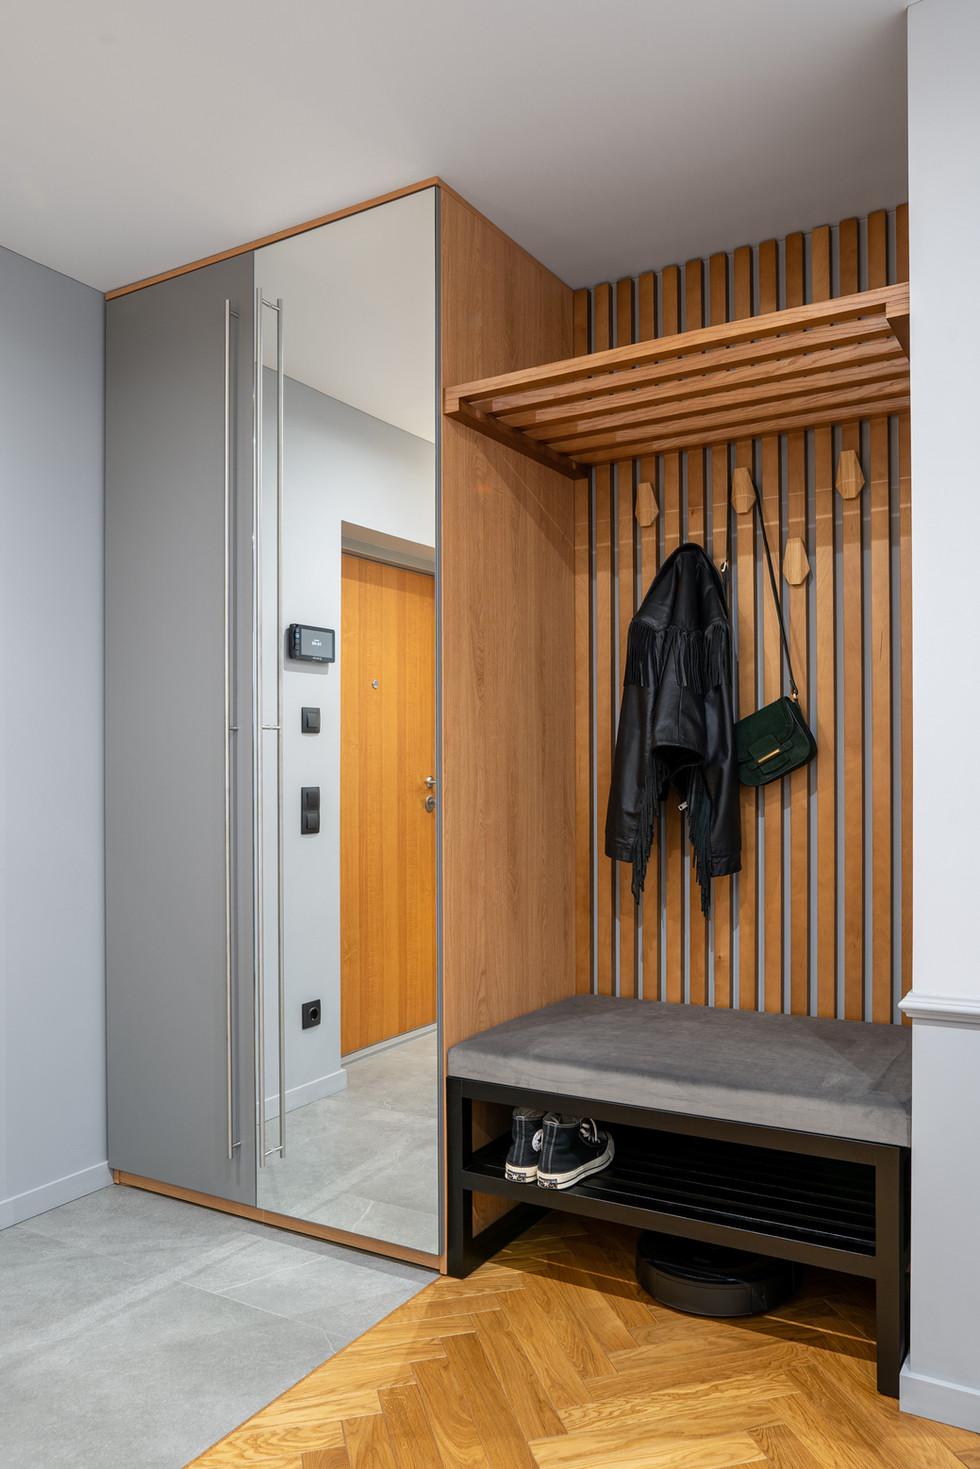 design interior SHUBOCHKINI architects SIA дизайн интерьераHDR.jpg